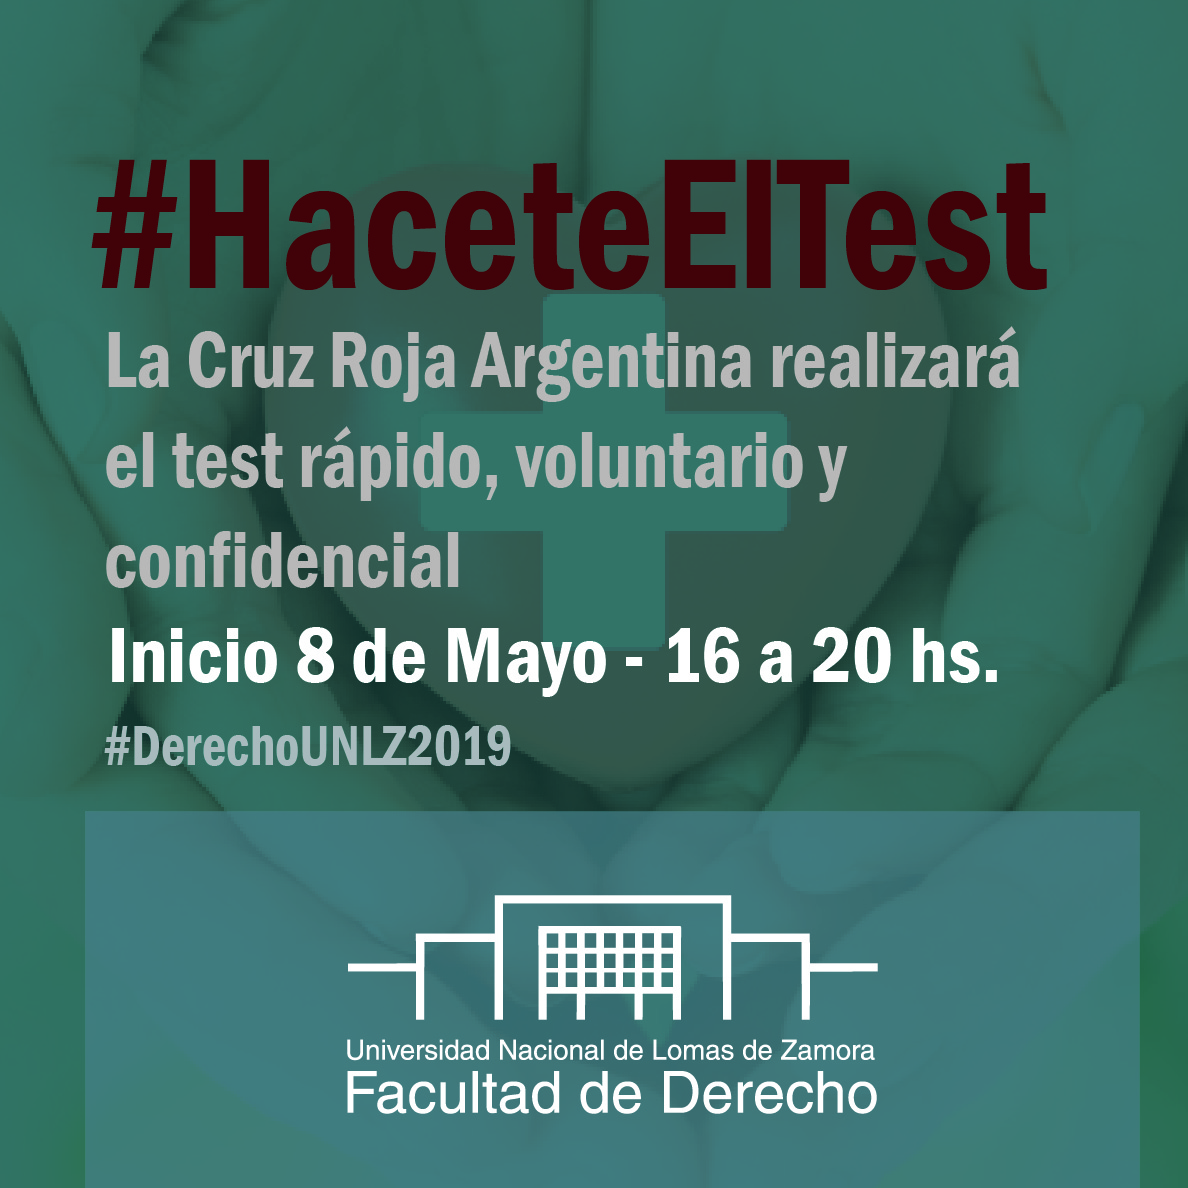 #HaceteElTest